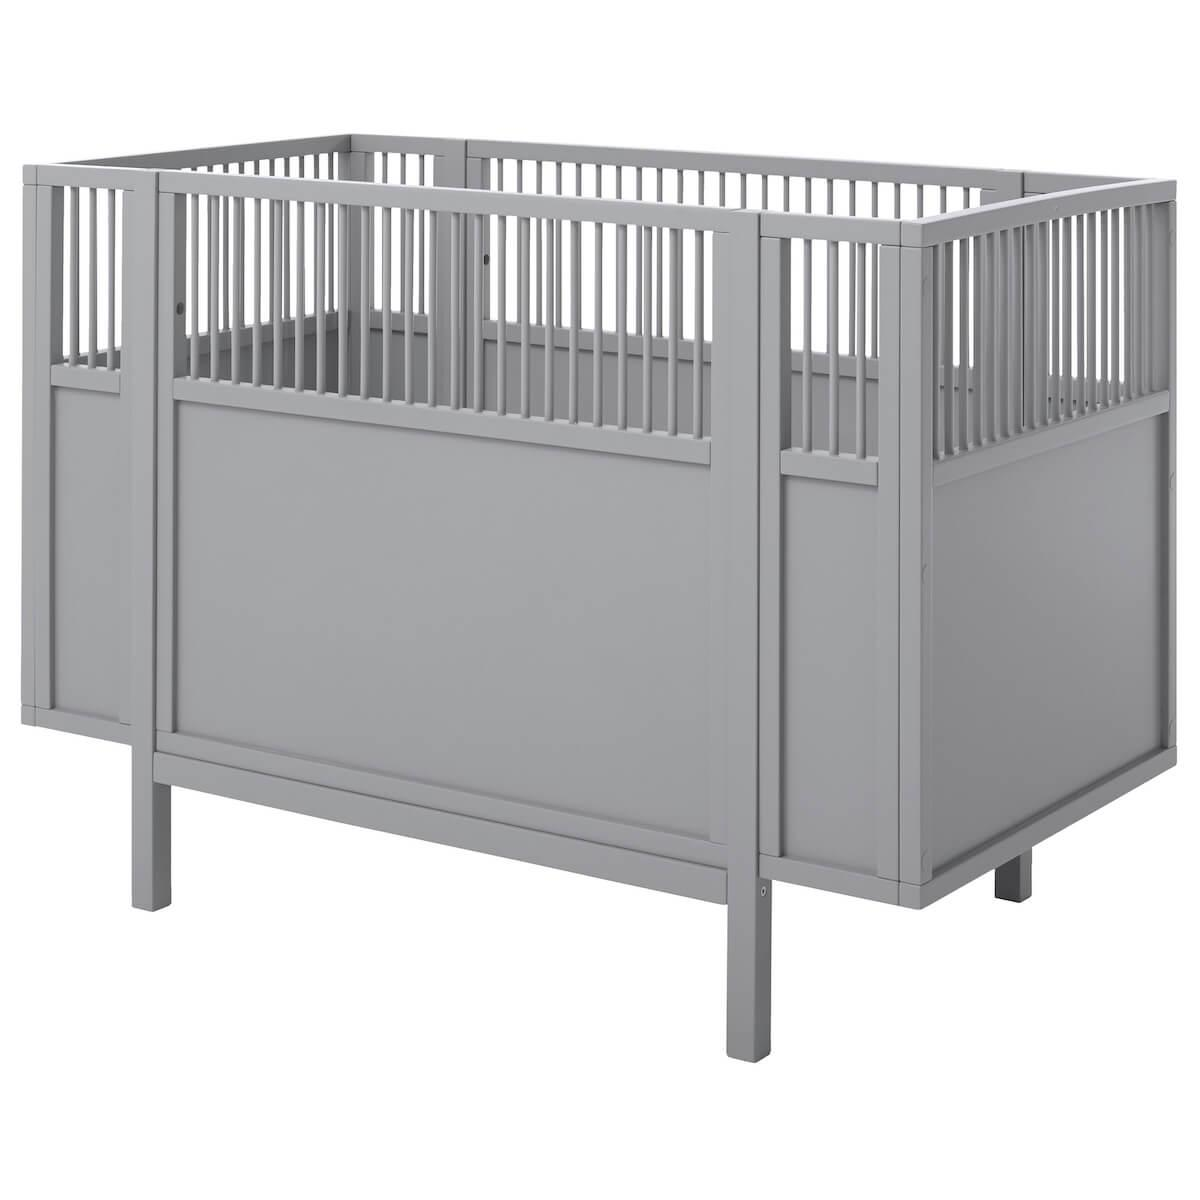 Cuna bebé 60x120cm Lifetime gris